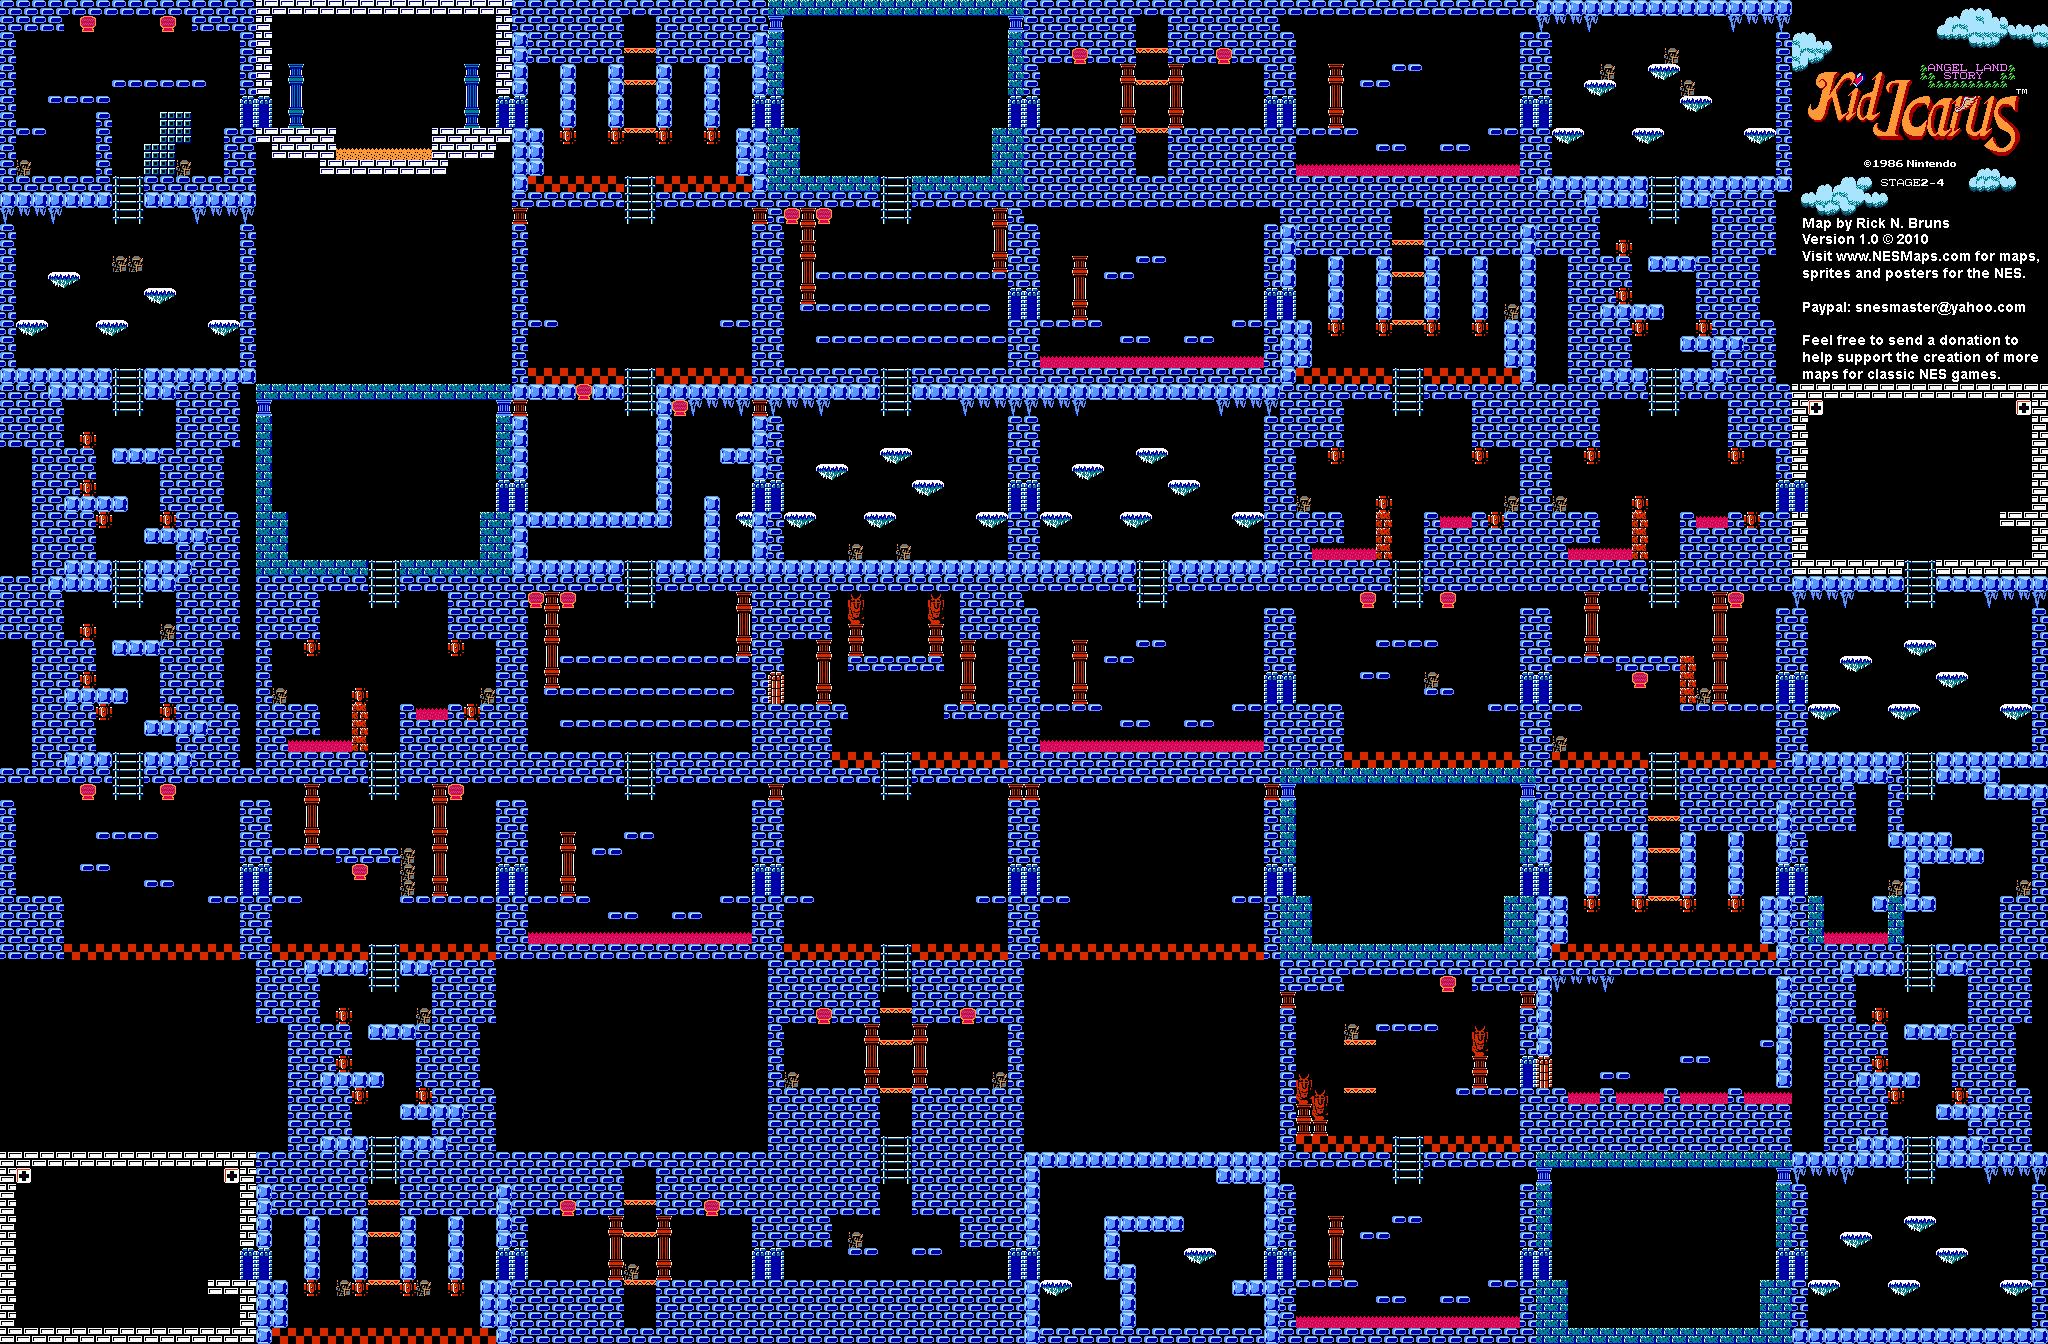 Kid Icarus - Stage 2-4 Map BG